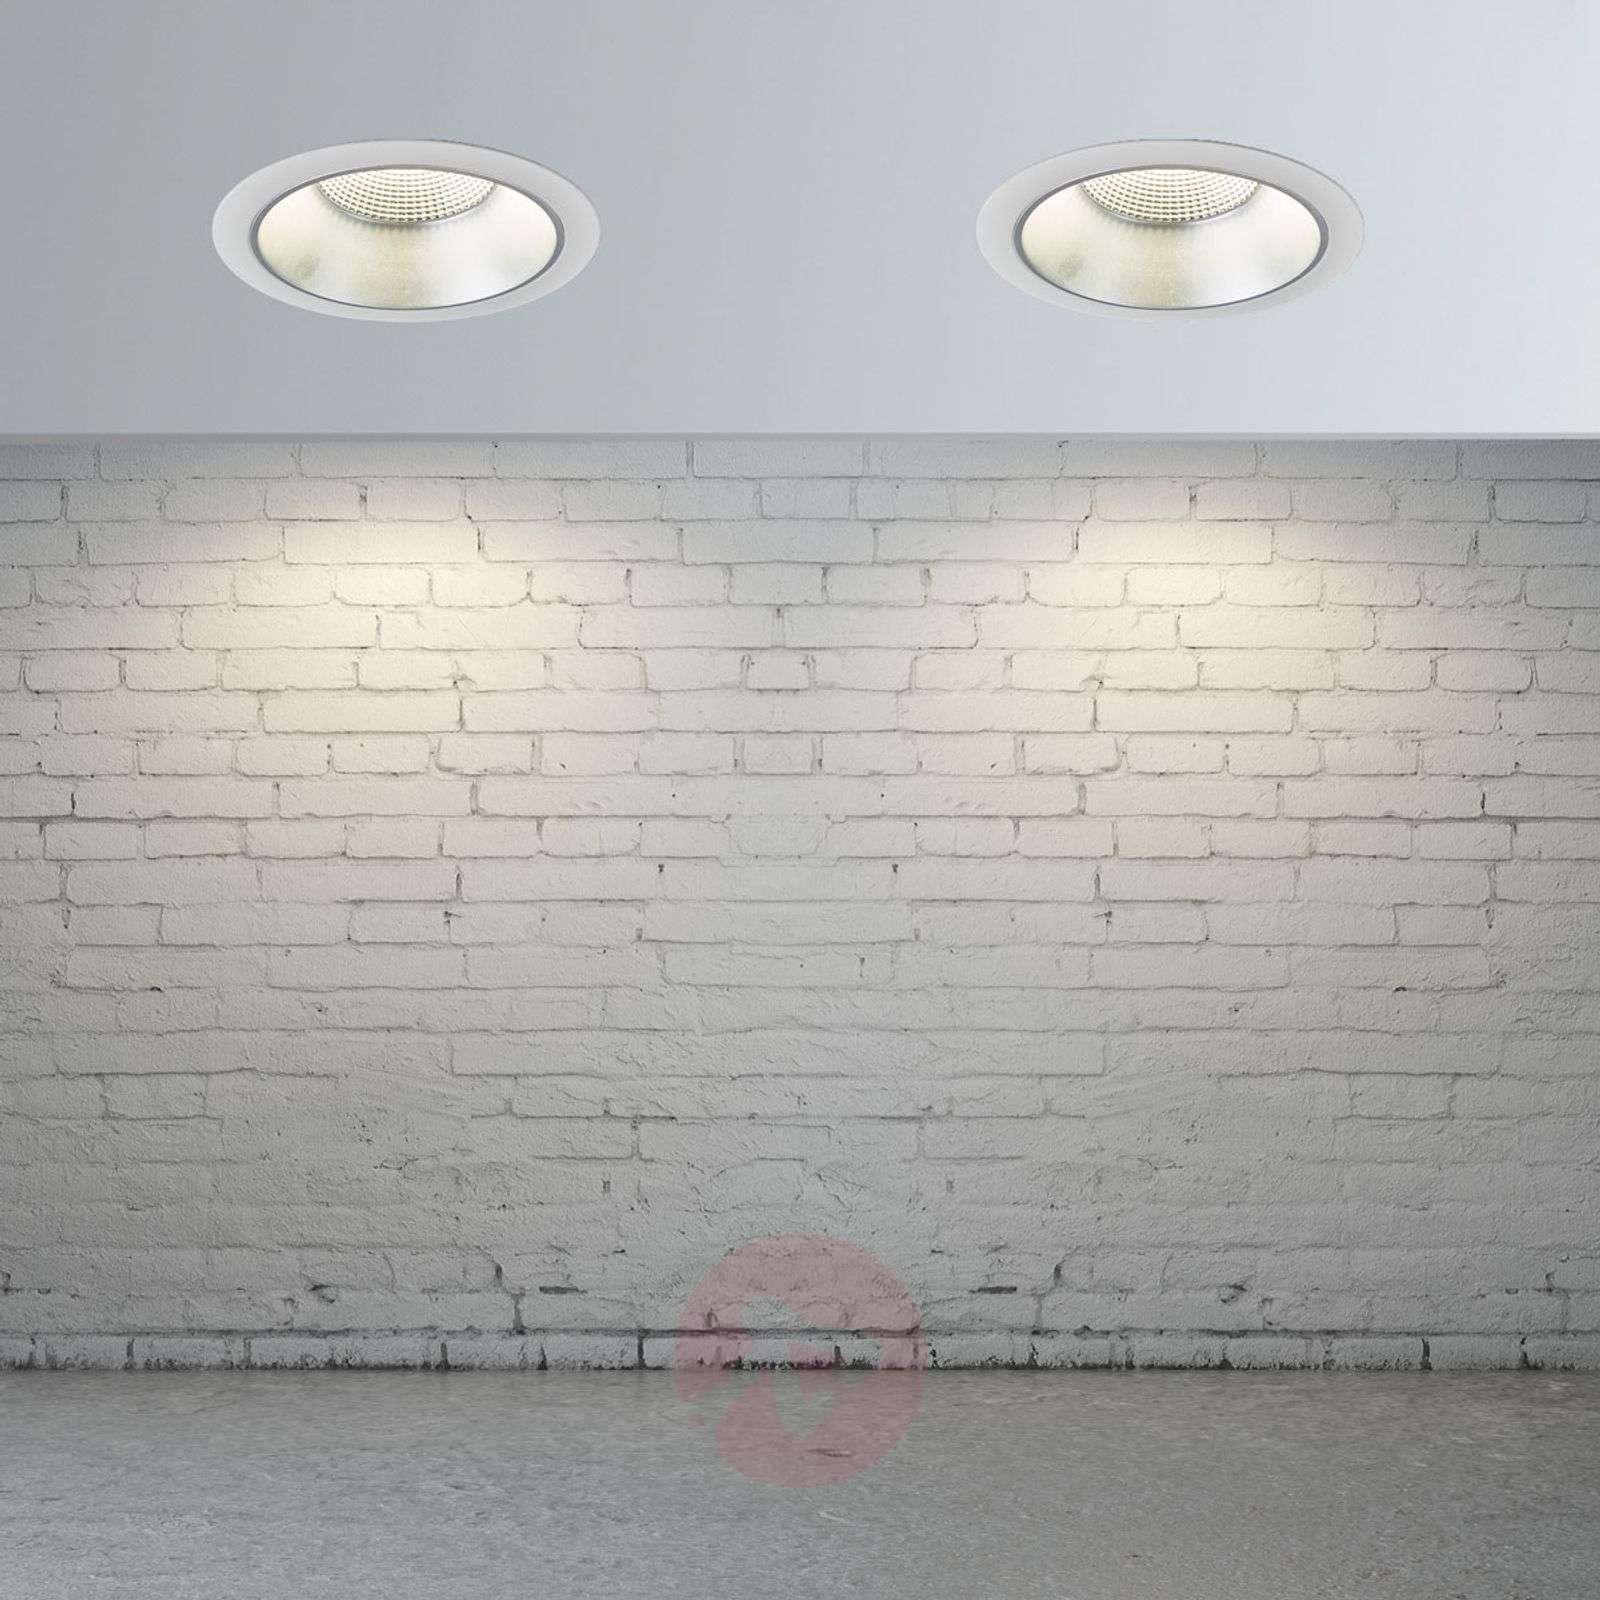 Powerful Jannis LED downlight-9978043-02